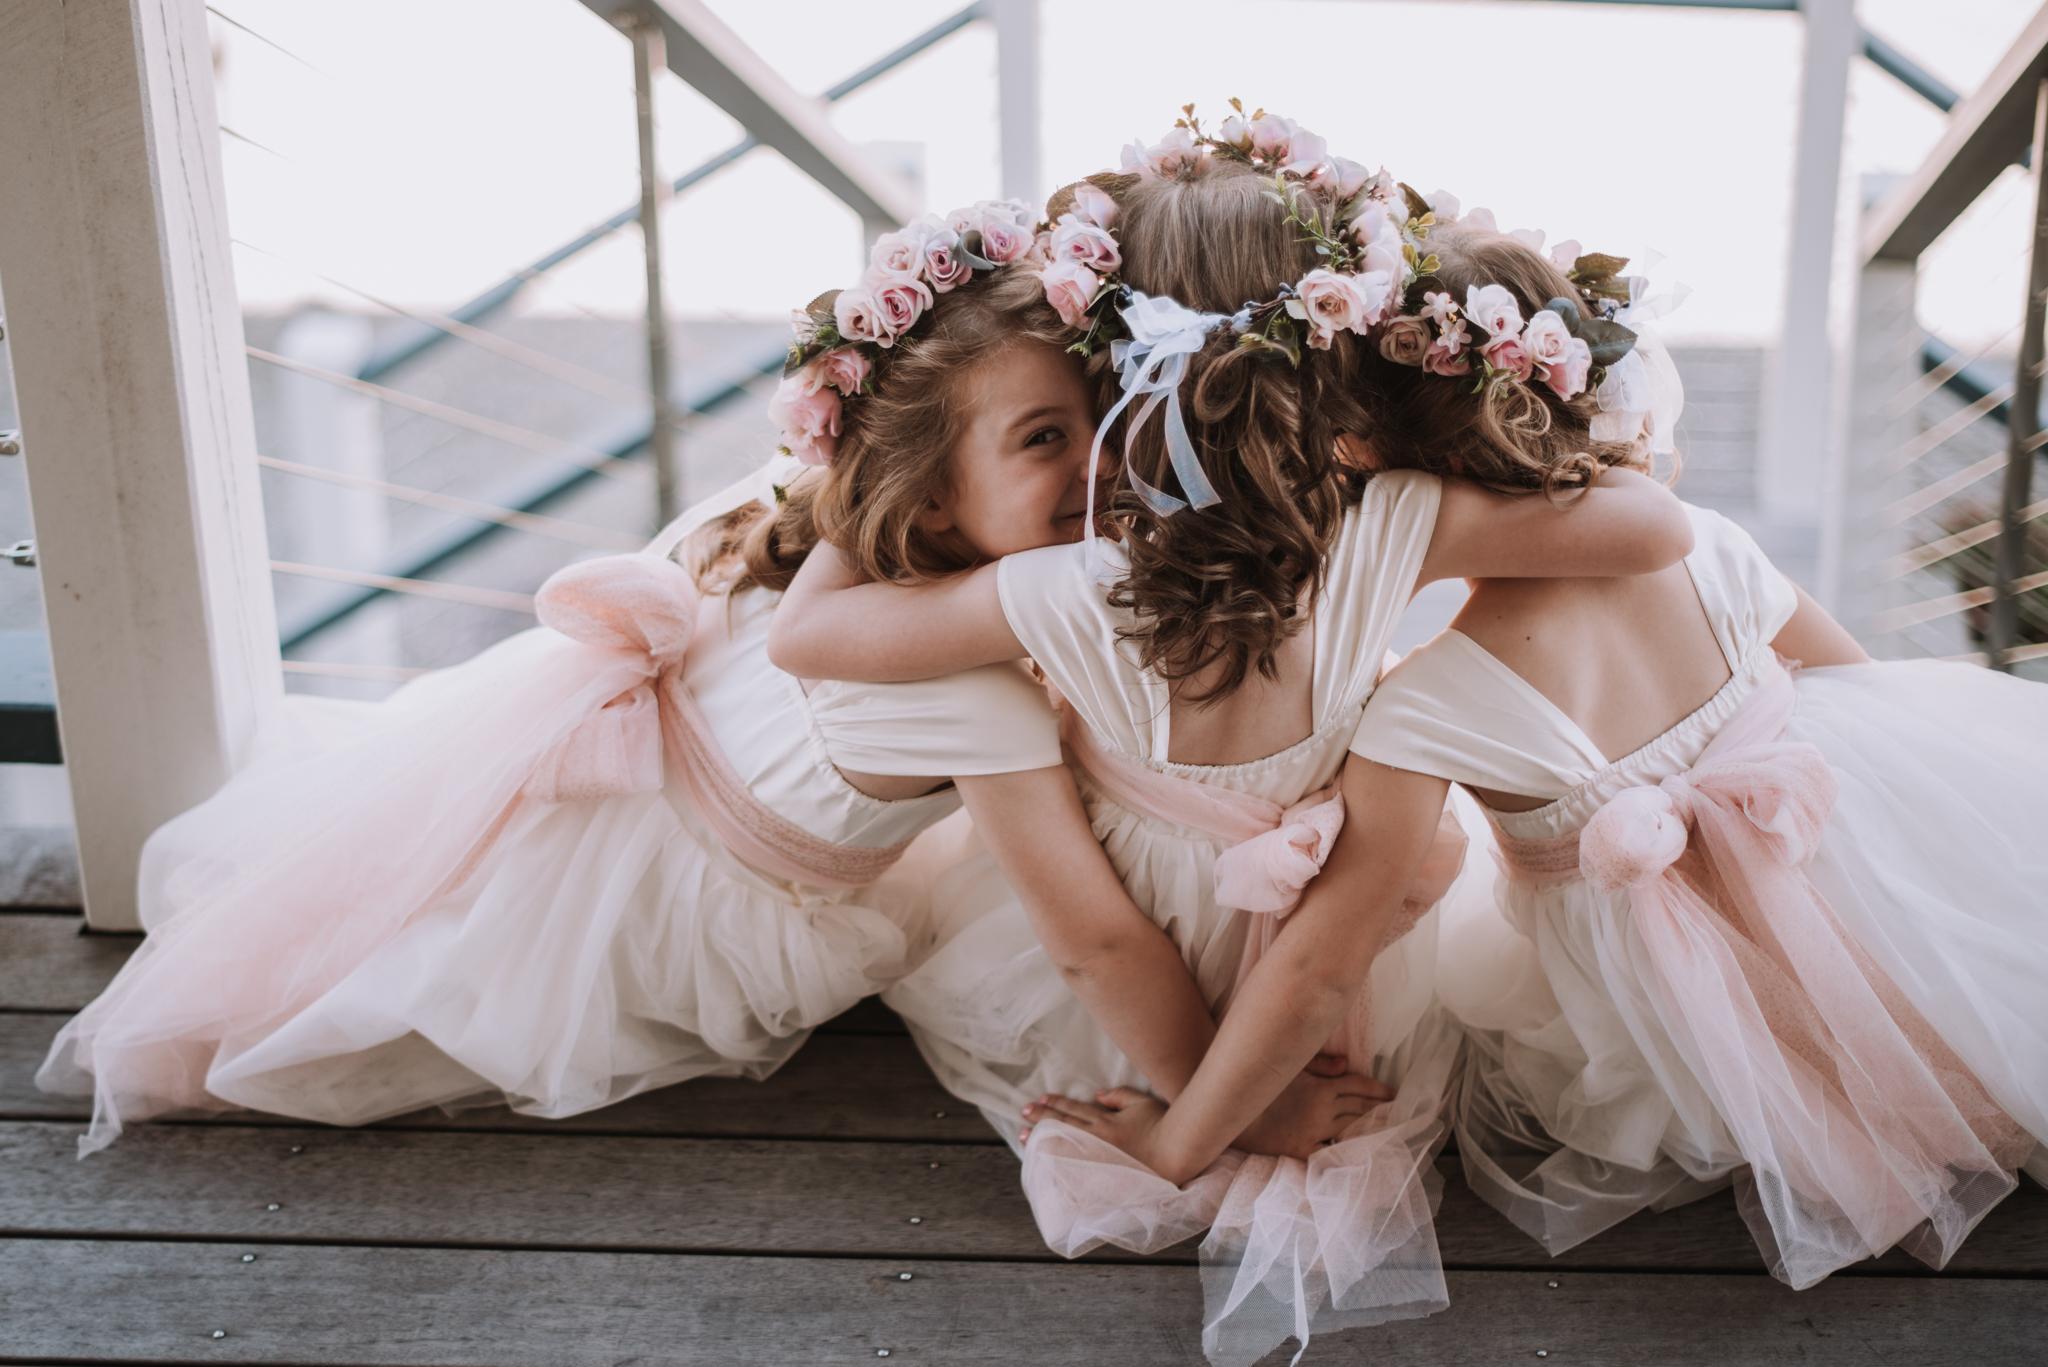 LOVELENSCAPES PHOTOGRAPHY - M + S - OCEAN VIEW ESTATES WINERY & RESTAURANT WEDDING • 89.jpg